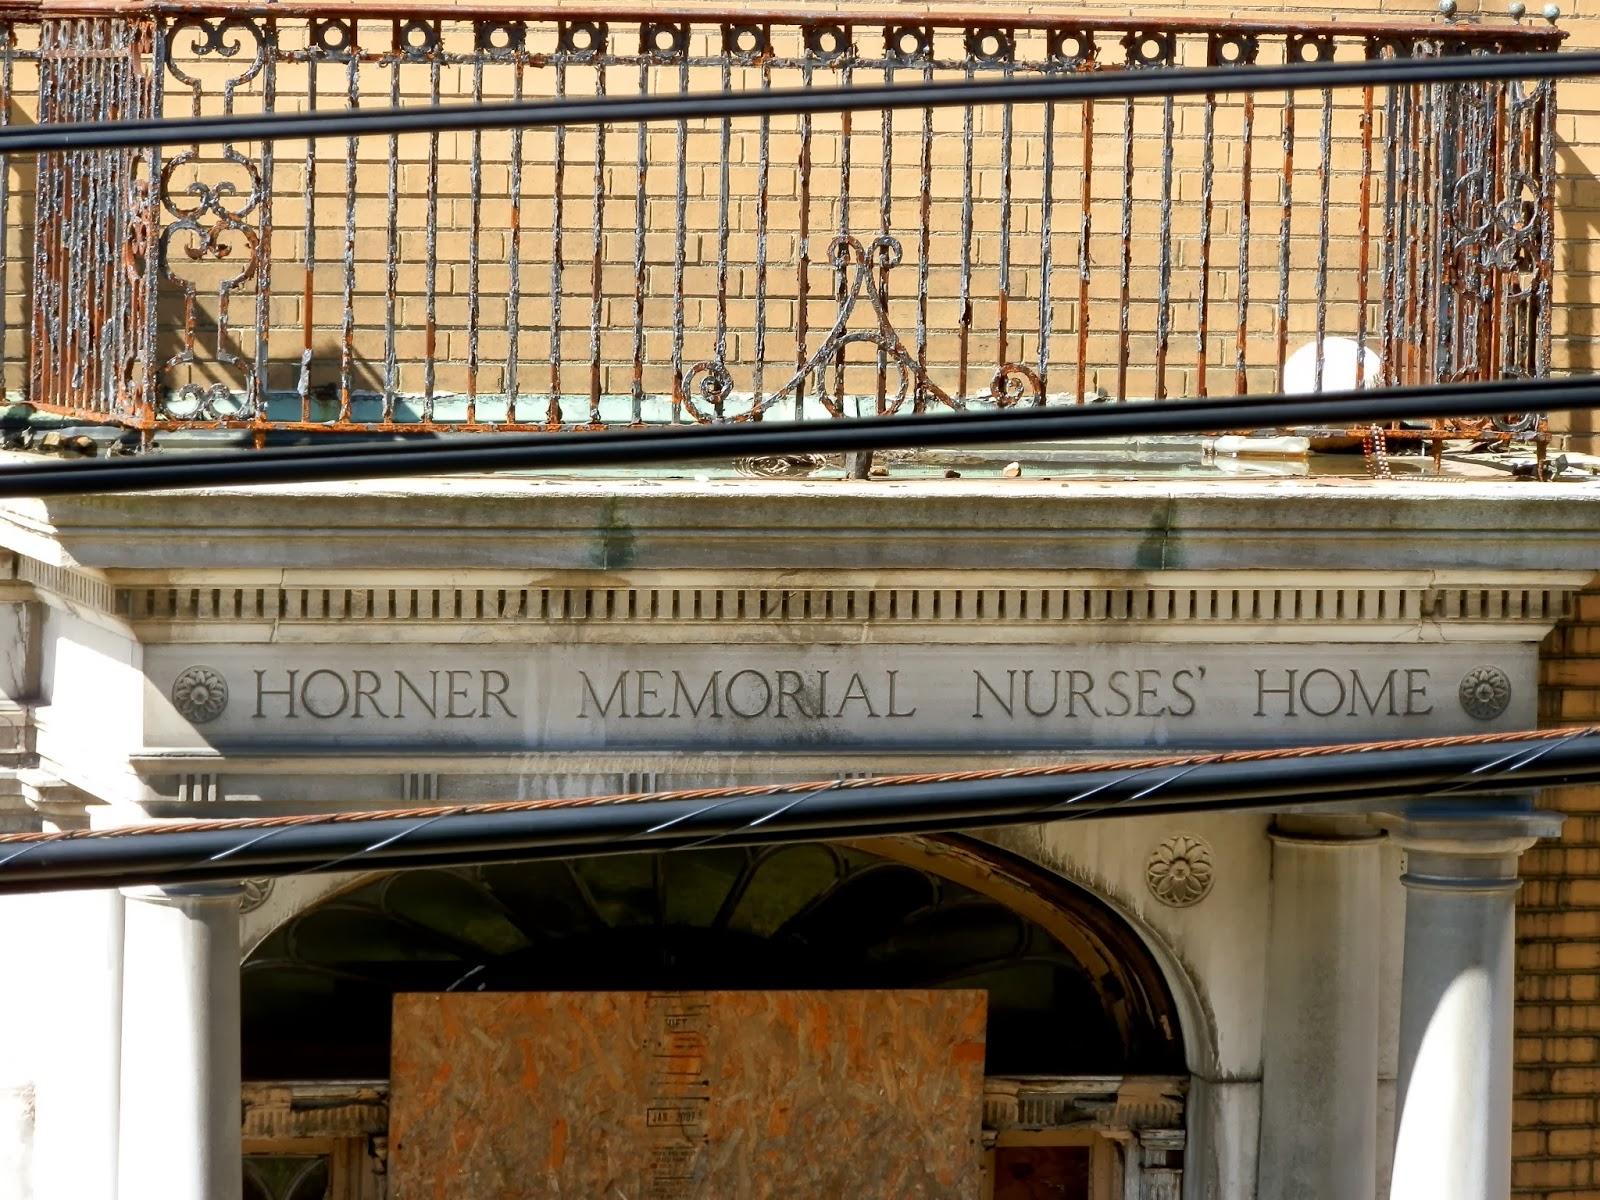 Horner Memorial Nurses Home